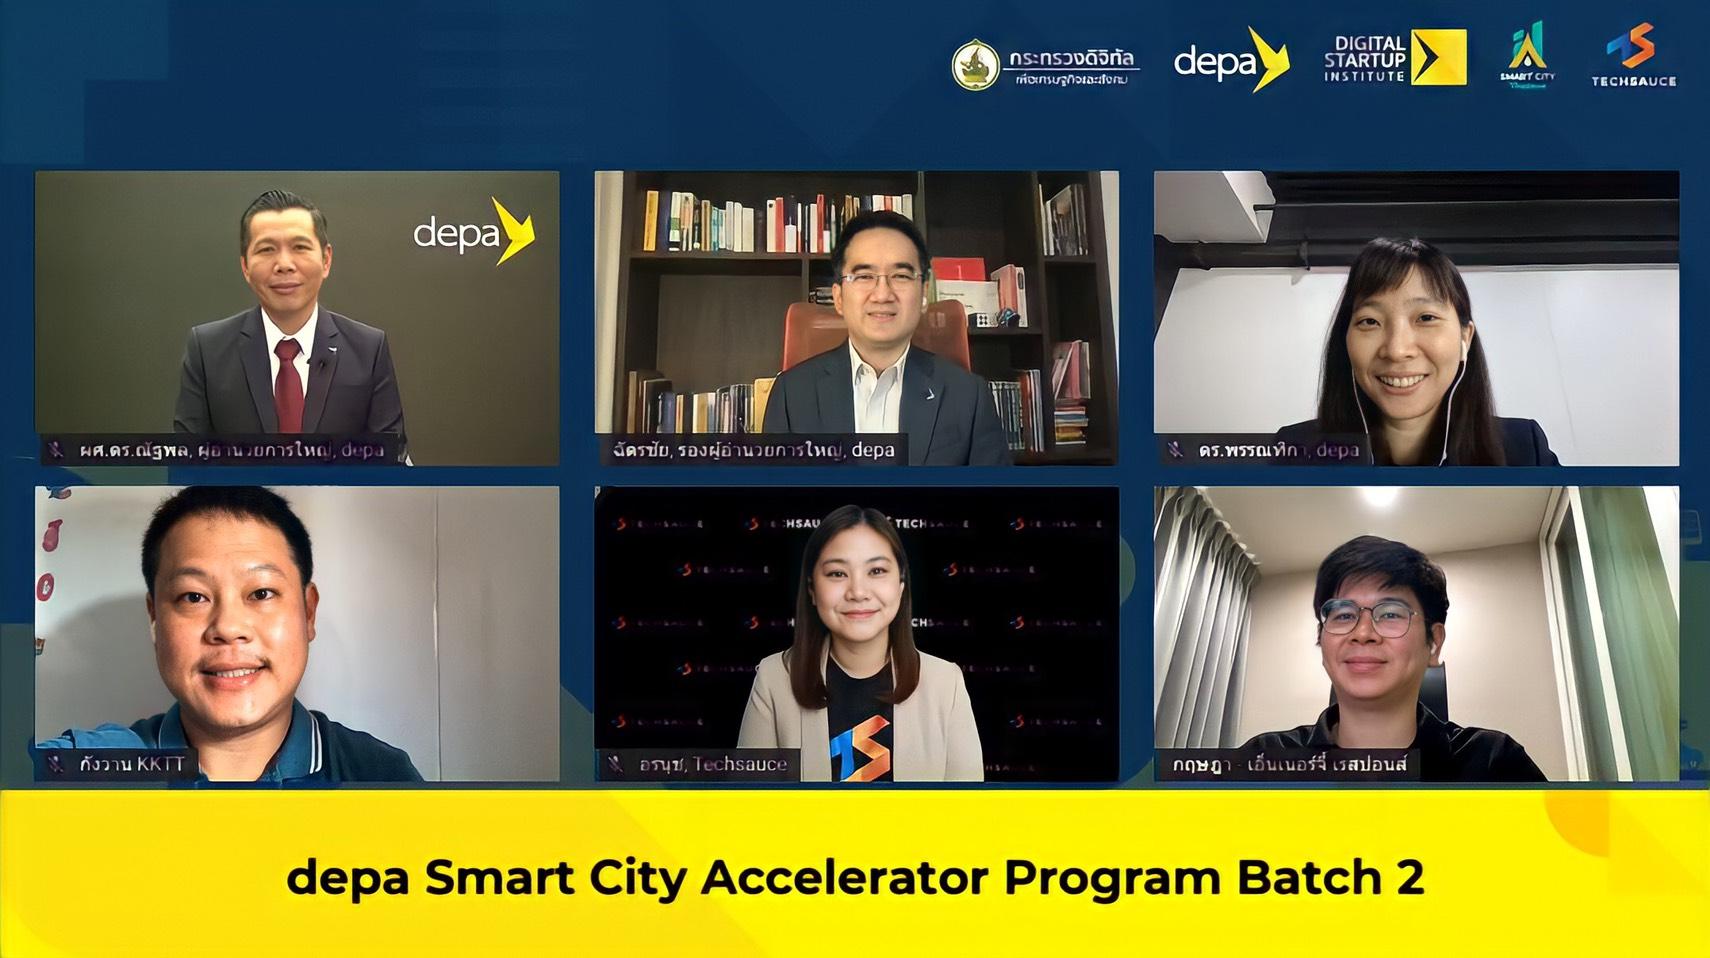 DEPA จับมือ Techsauce เปิดตัวโครงการ depa Smart City Accelerator Program Batch 2